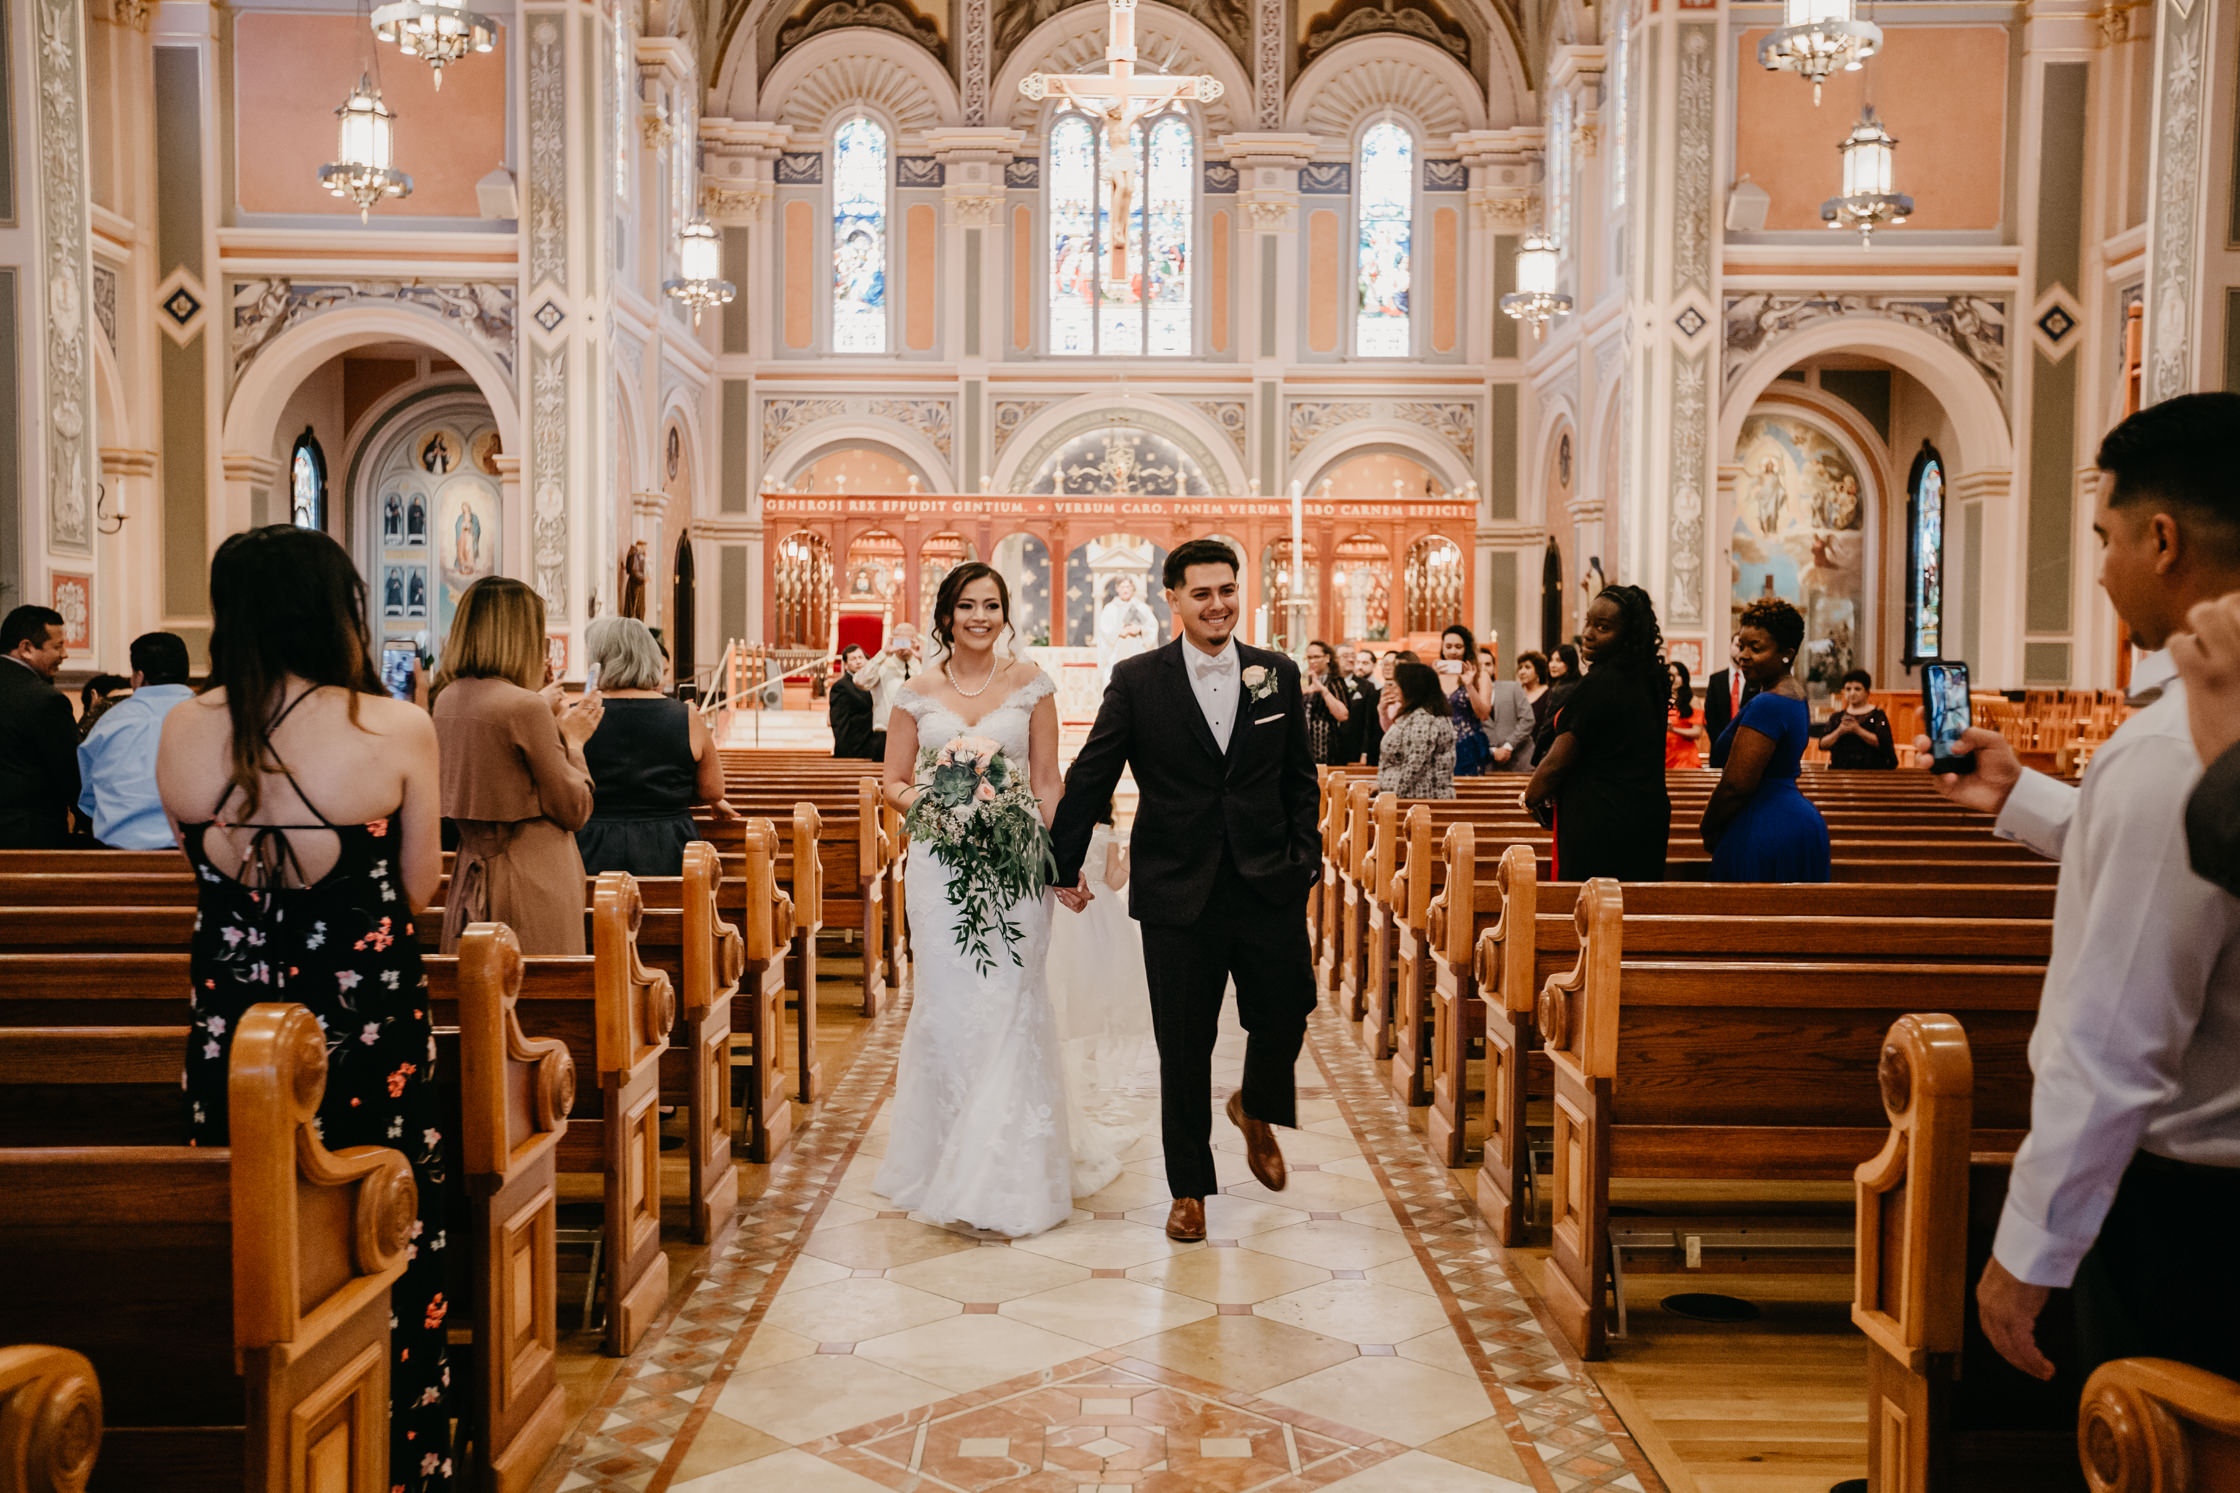 luis_joanna_wedding-44.jpg